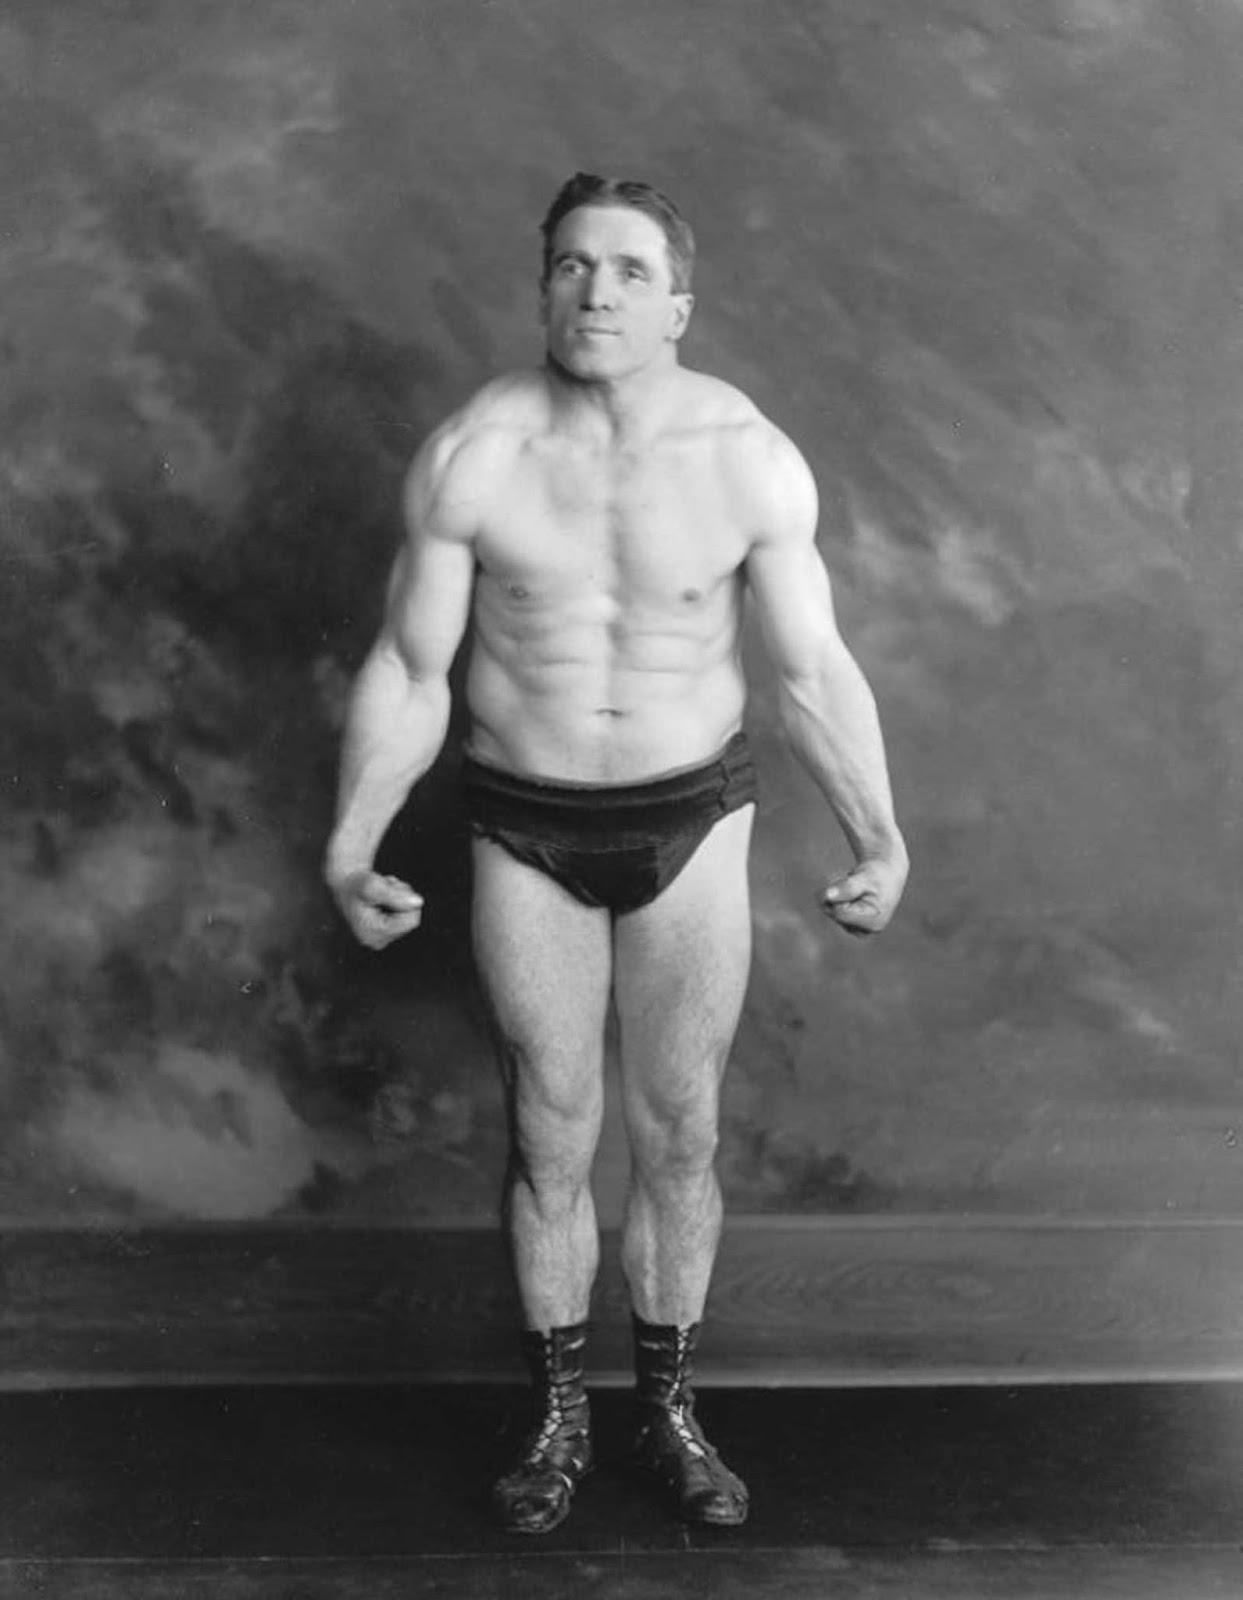 A. Dandurand, 1927.